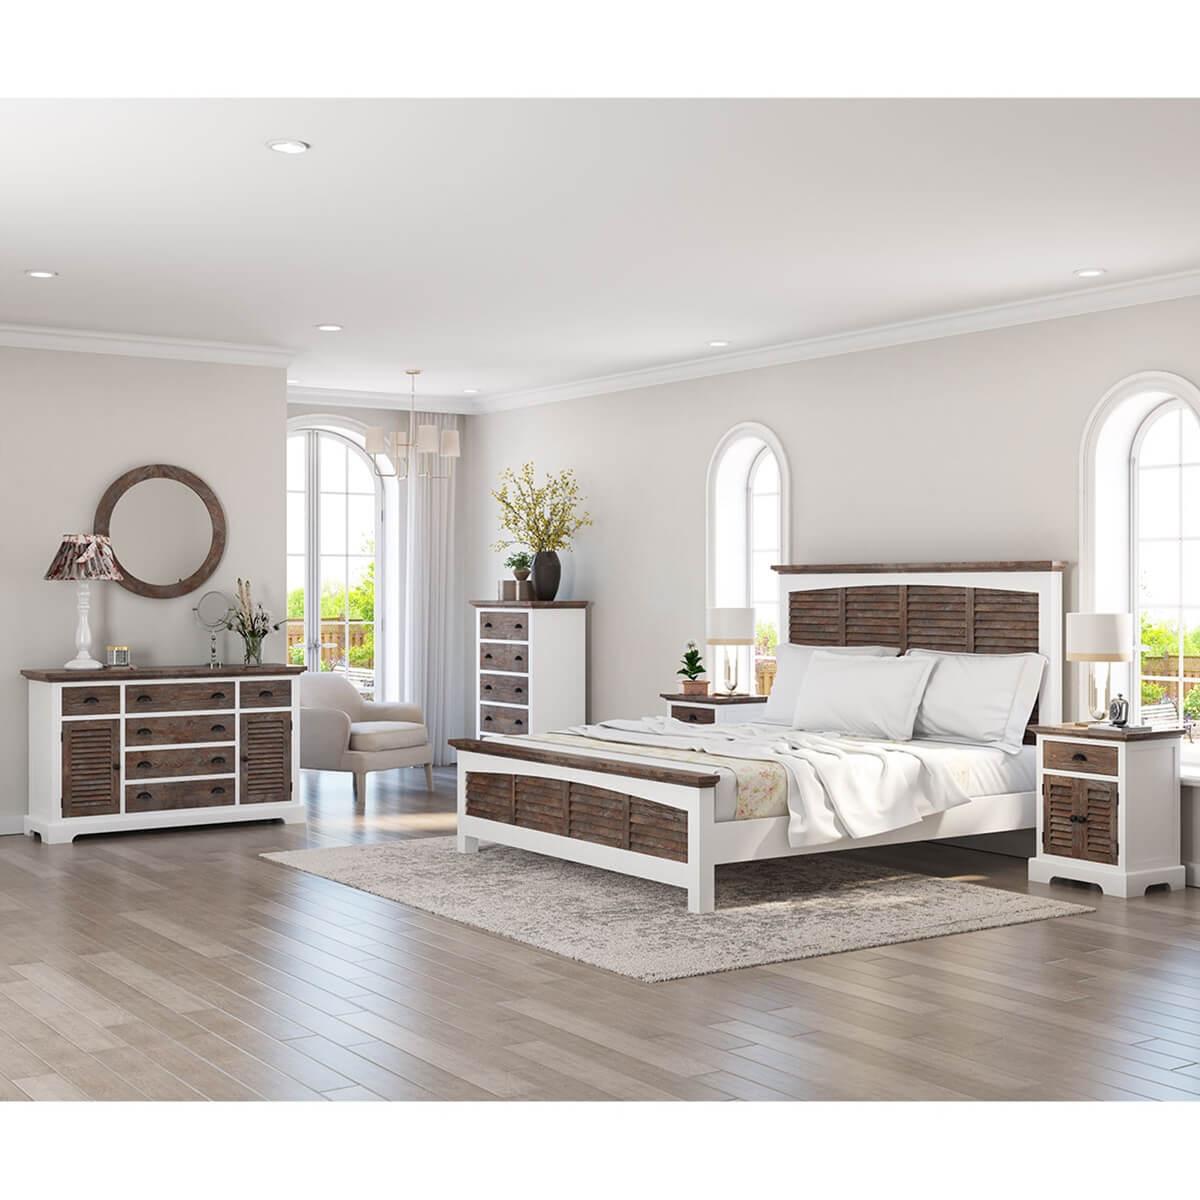 Danville Teak And Mahogany Wood Modern 5 Piece Bedroom Set